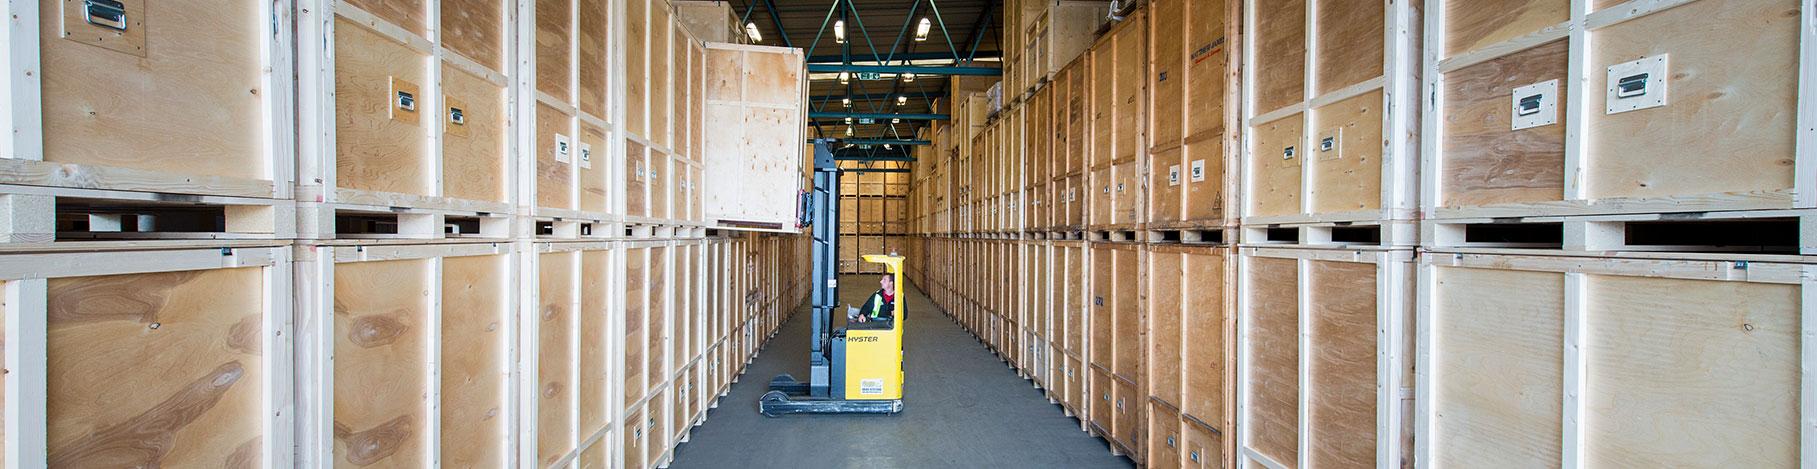 We offer storage in London, Barcelona, Madrid and Estepona.